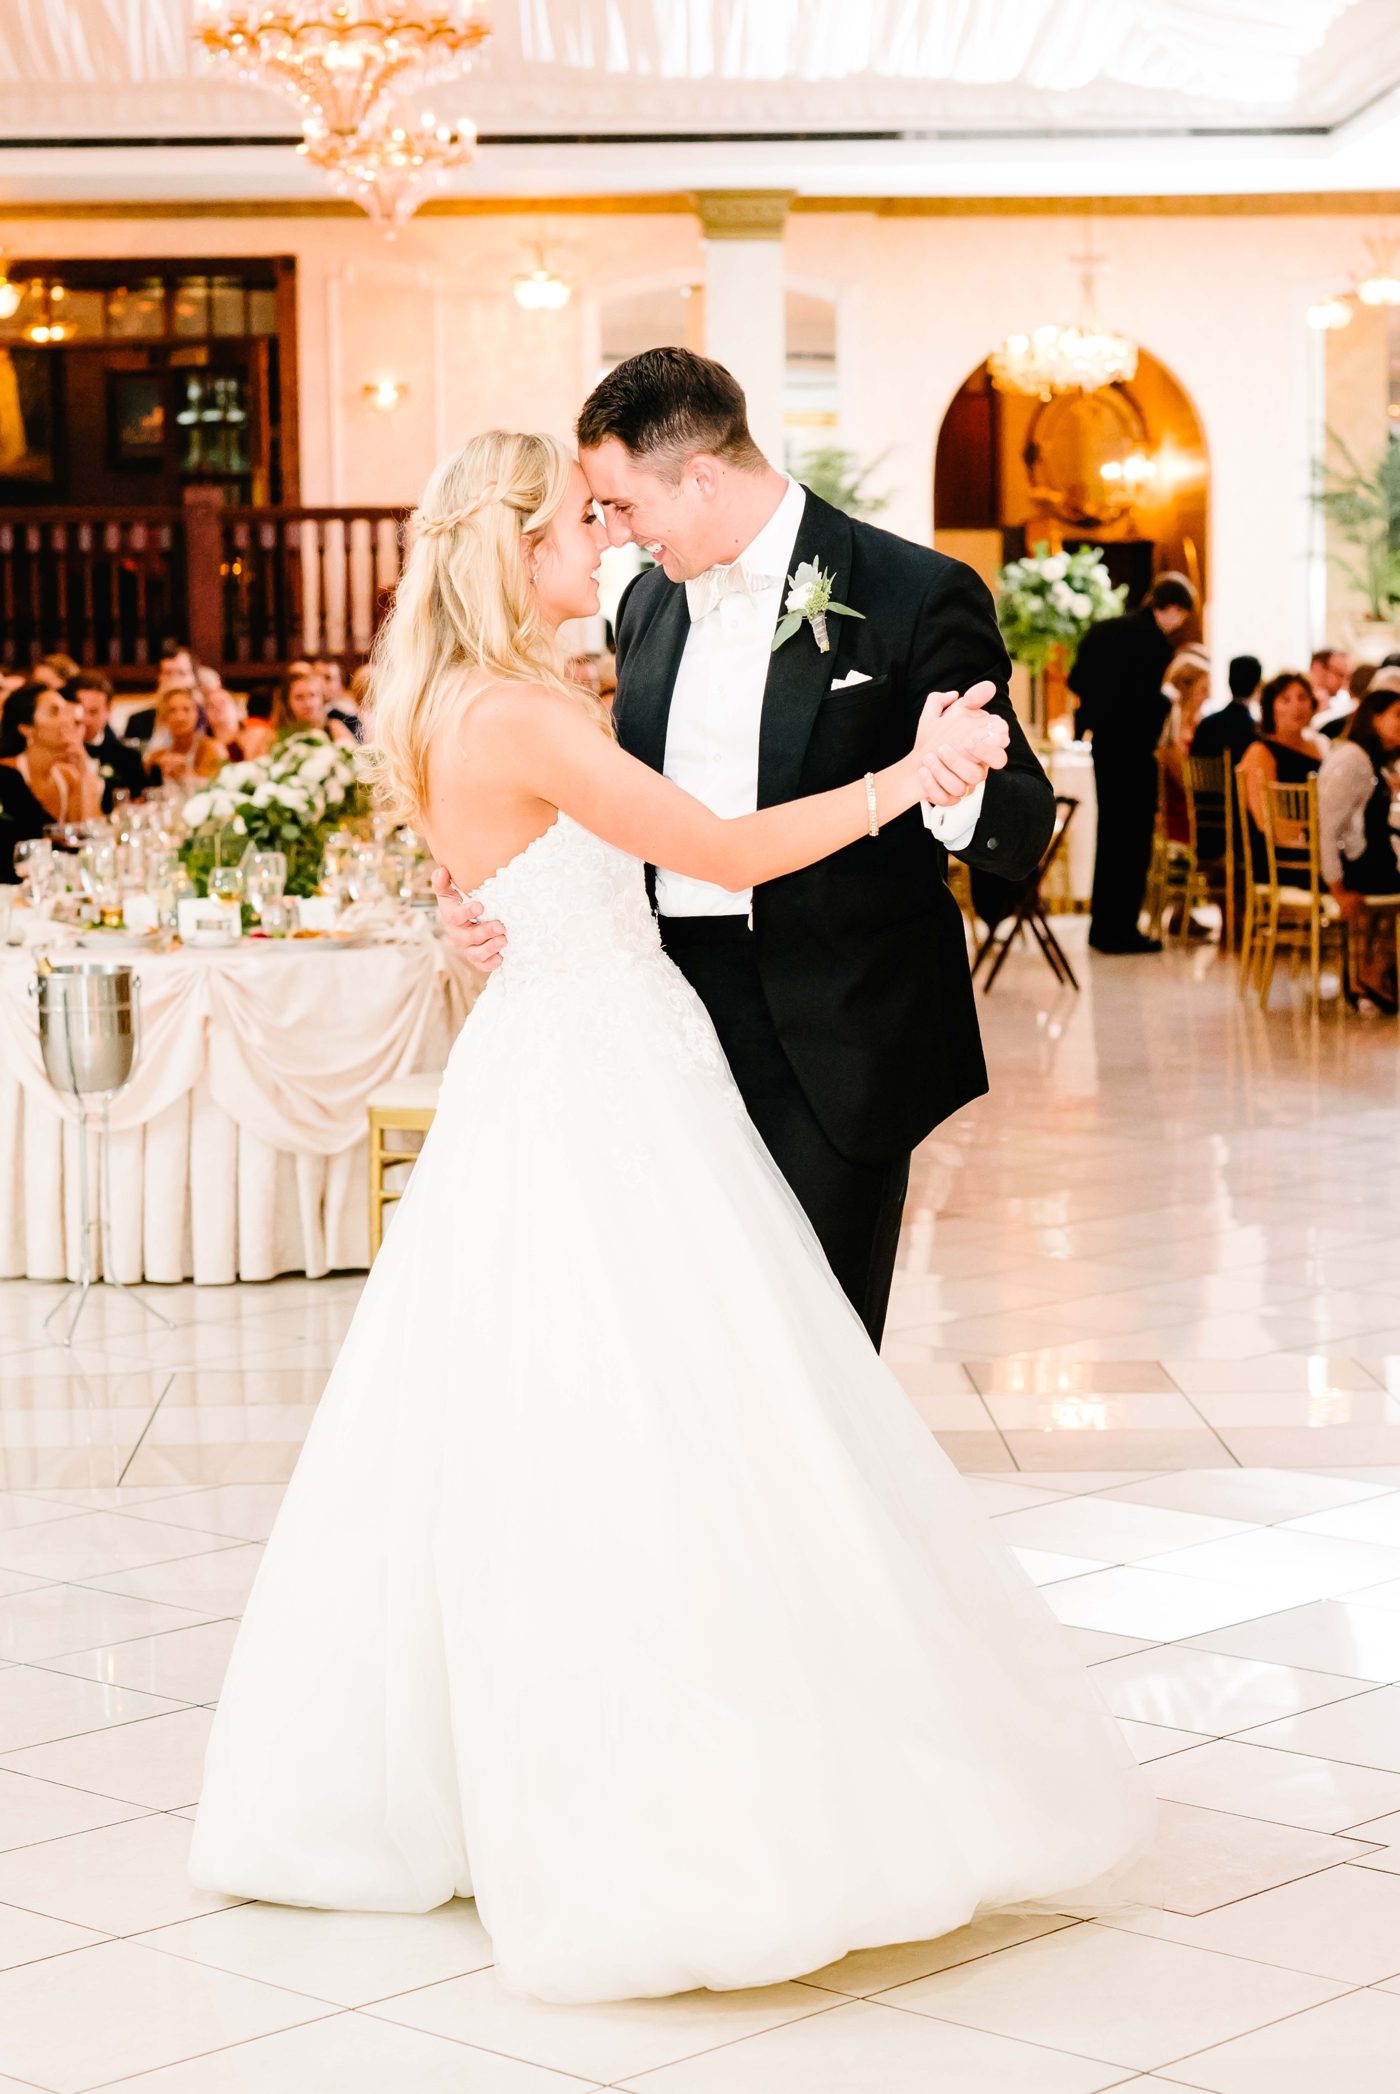 chicago-fine-art-wedding-photography-rubright64